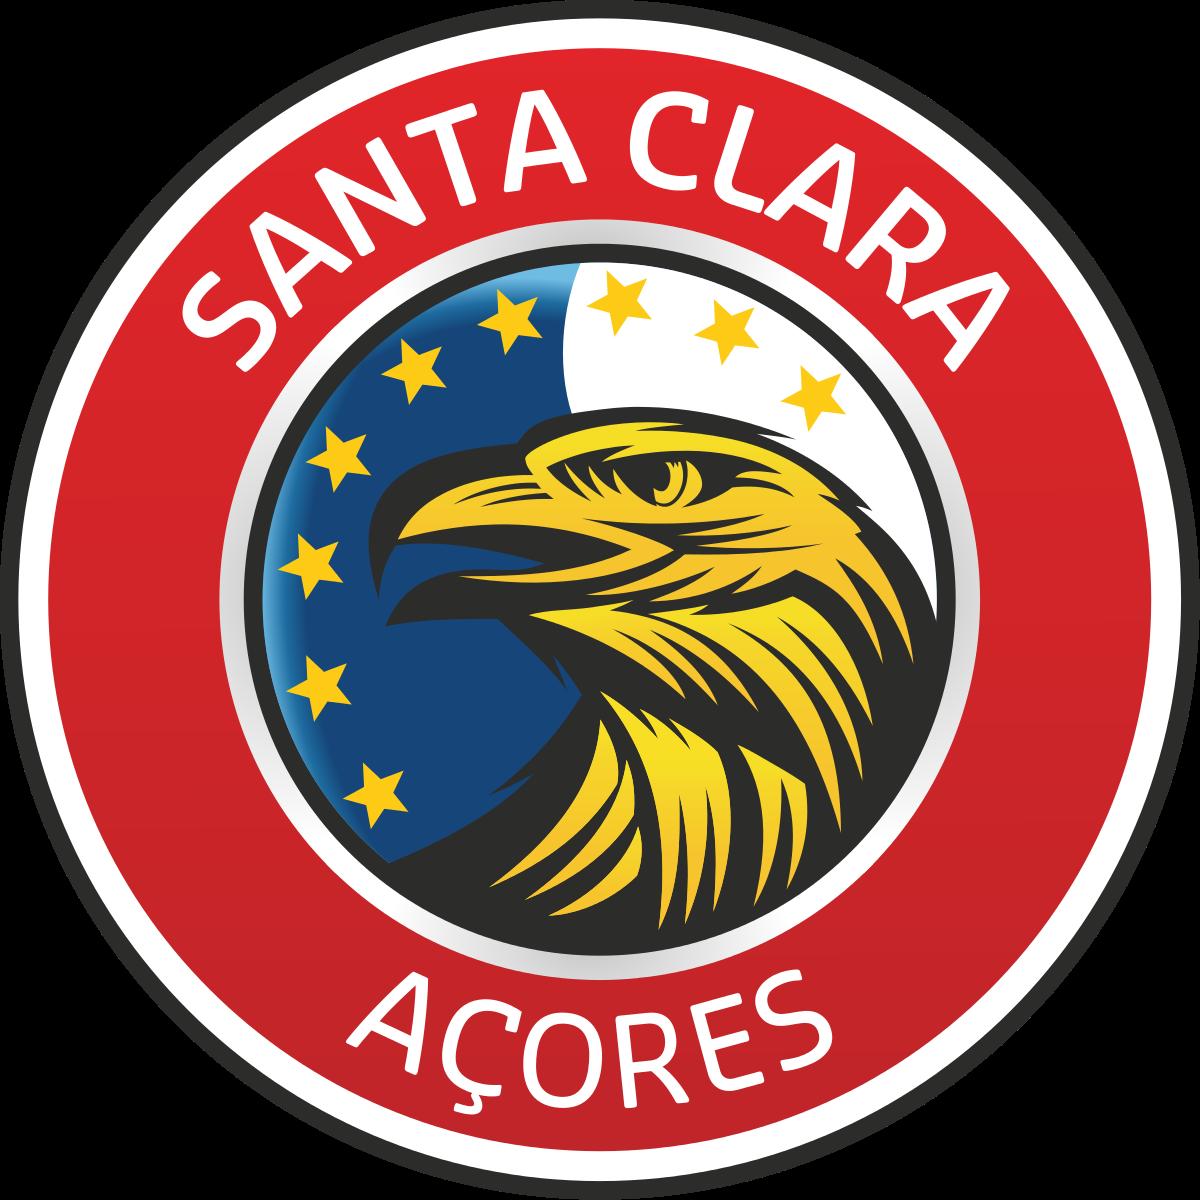 C D Santa Clara Wikipedia Santa Clara Football Logo Sports Logo